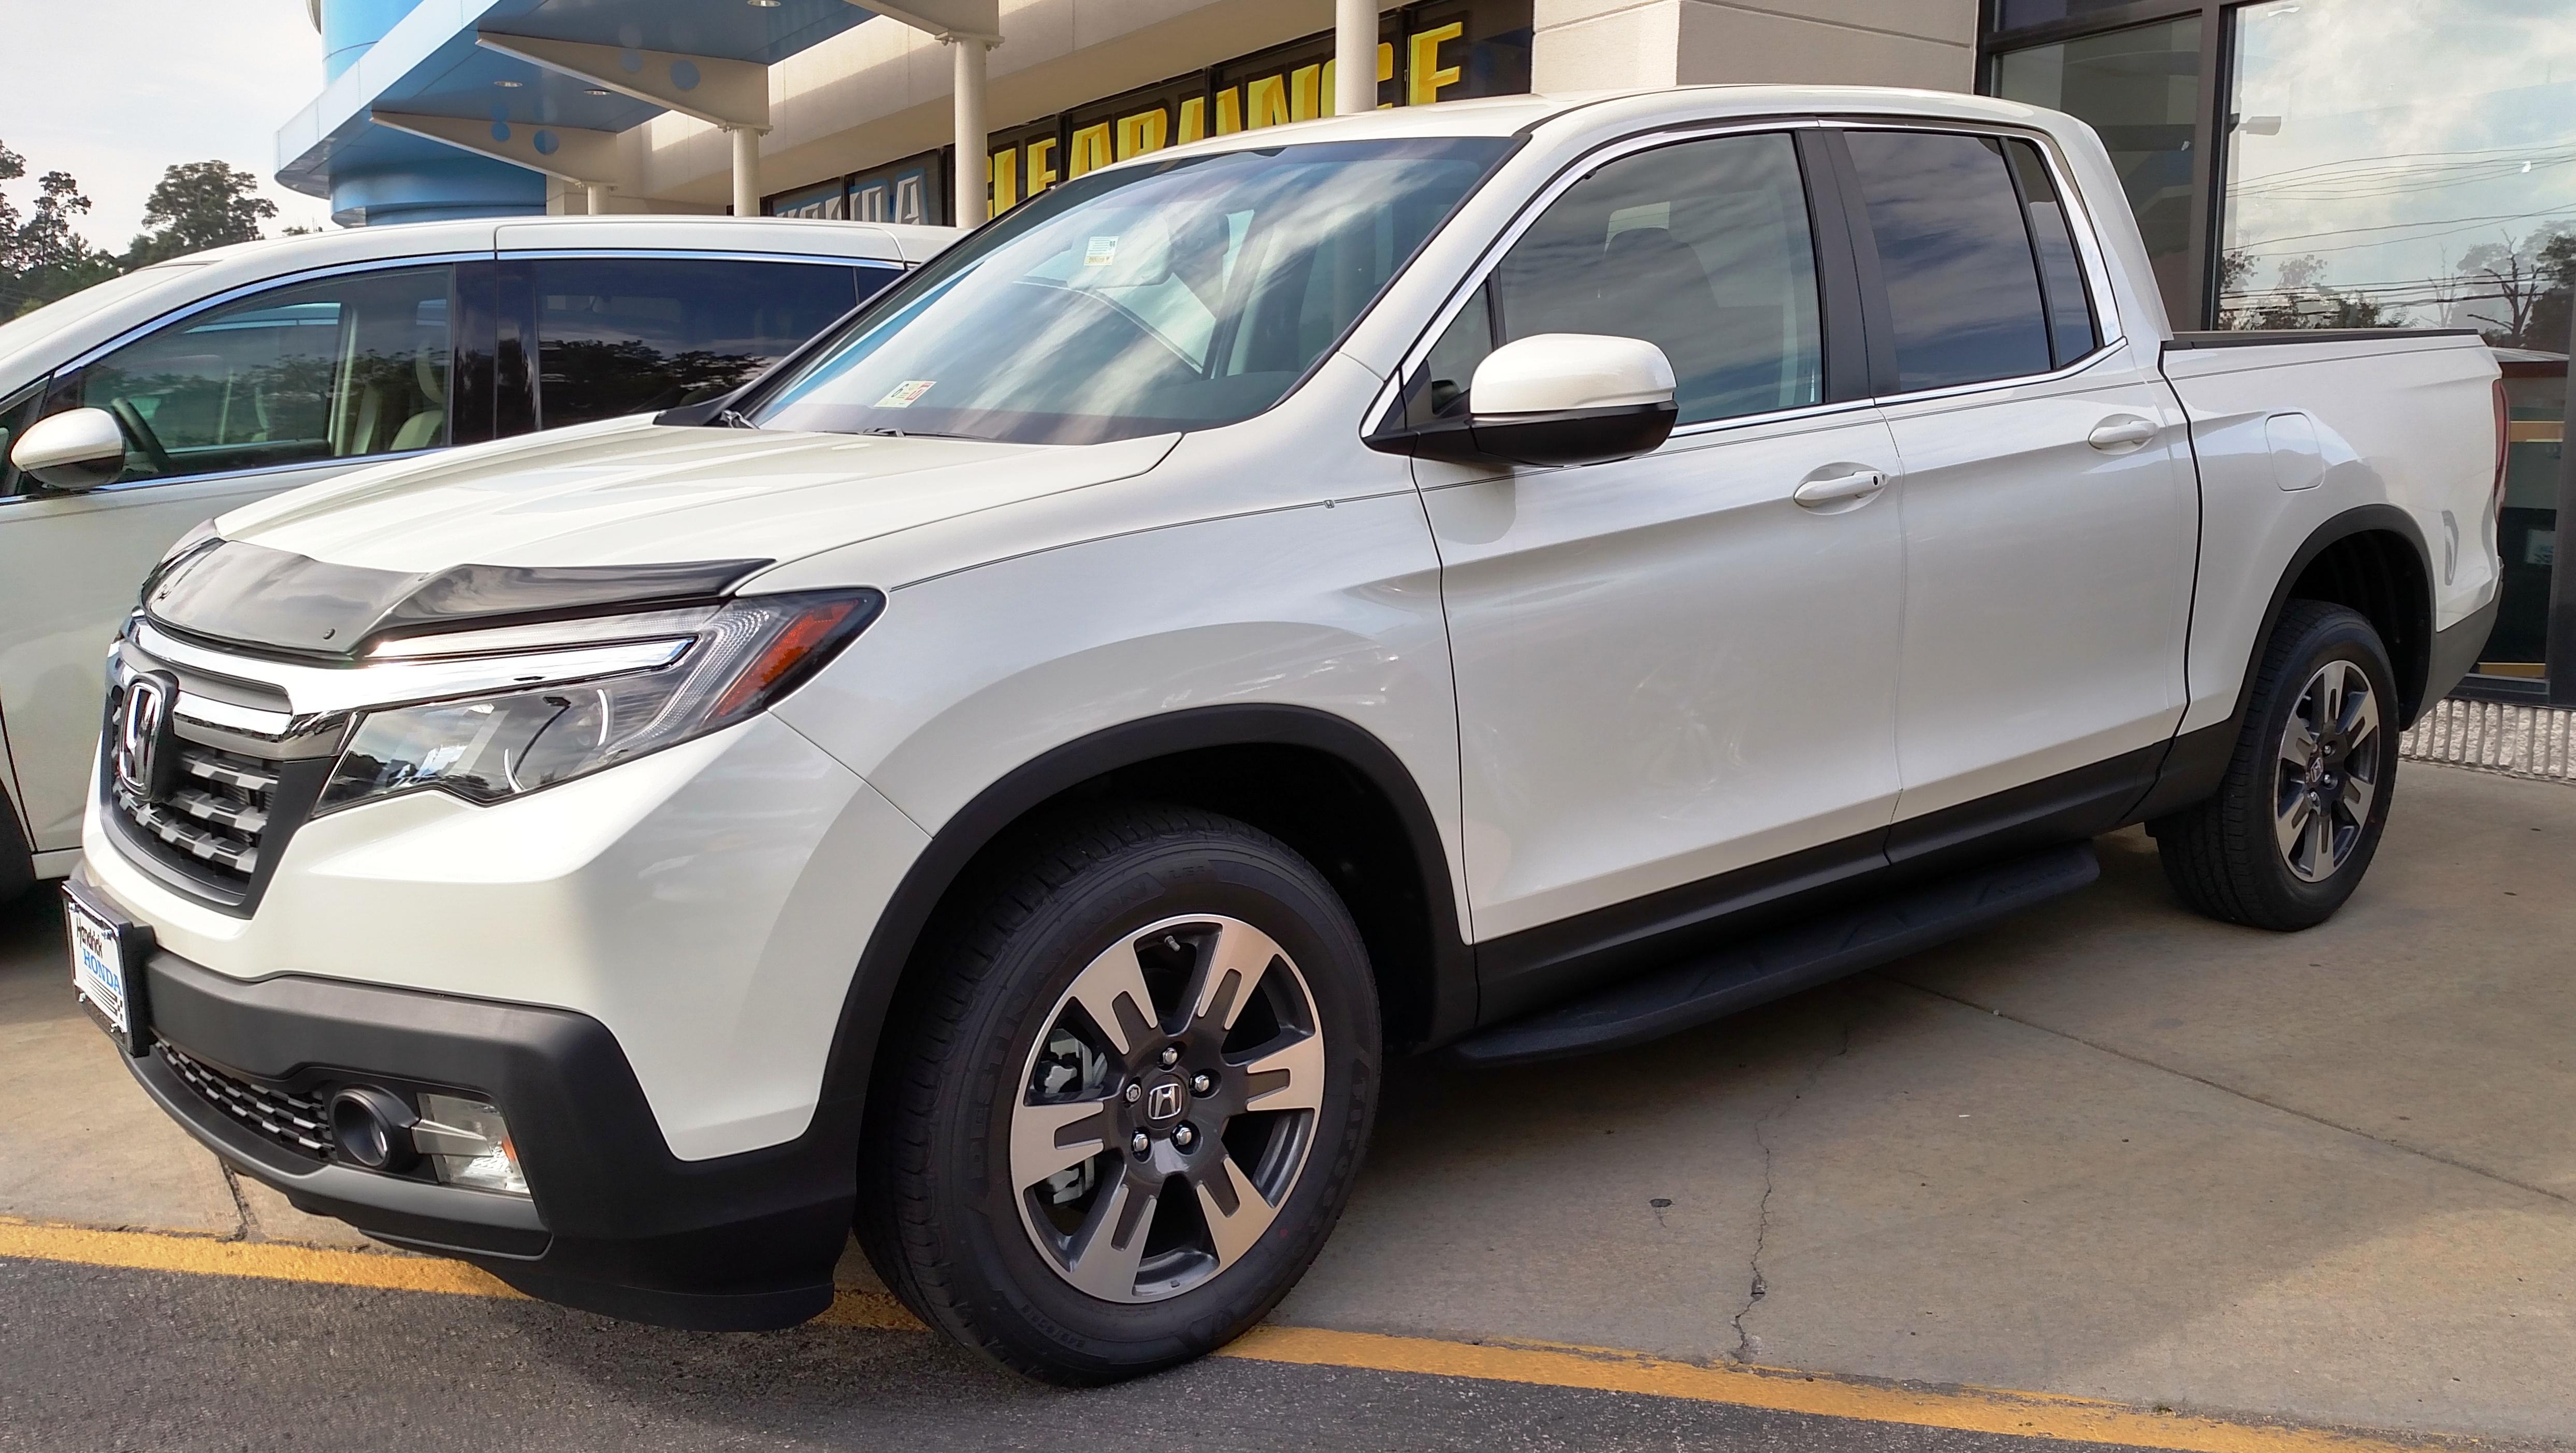 Image Result For Honda Ridgeline Rtl For Sale